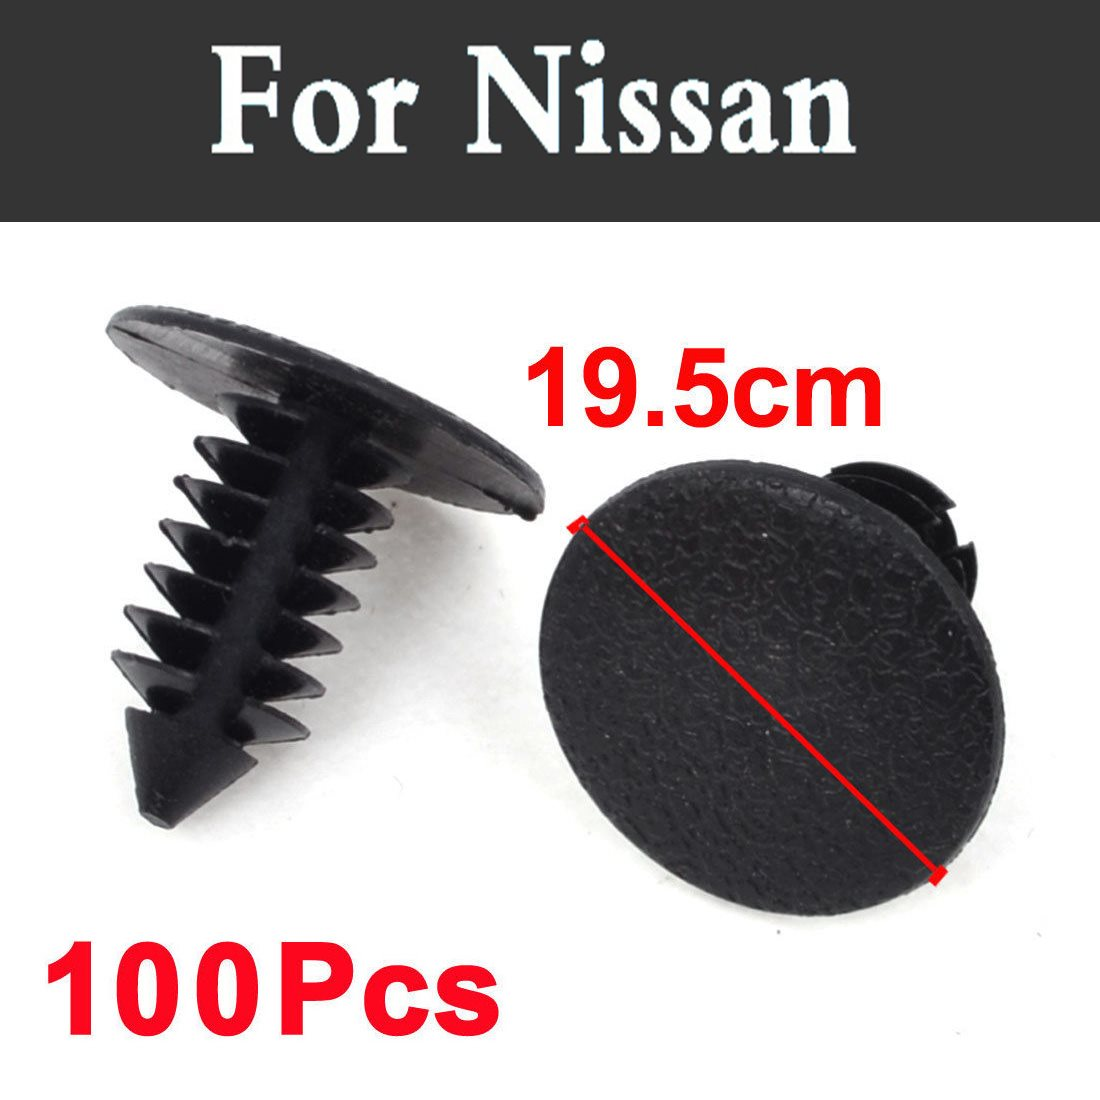 100pcs Fastener 19.5mm Hole Car Clips Fender Bumper Shield Retainer For Nissan Bluebird Sylphy Cedric Cima Crew Dualis Juke